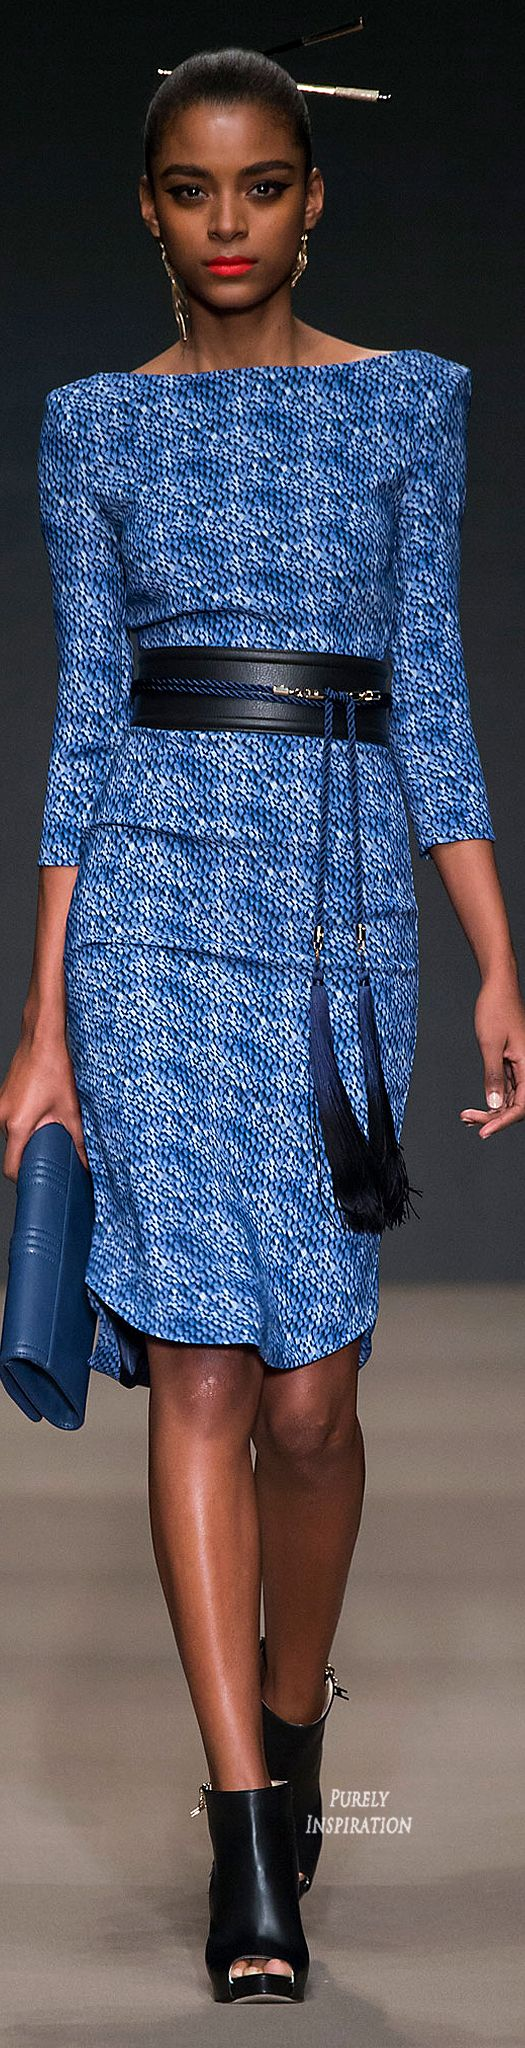 ♡AfroPolitan Elisabetta Franchi ~African fashion, Ankara, kitenge, Kente, African prints, Senegal fashion, Kenya fashion, Nigerian fashion, Ghanaian fashion ~DKK